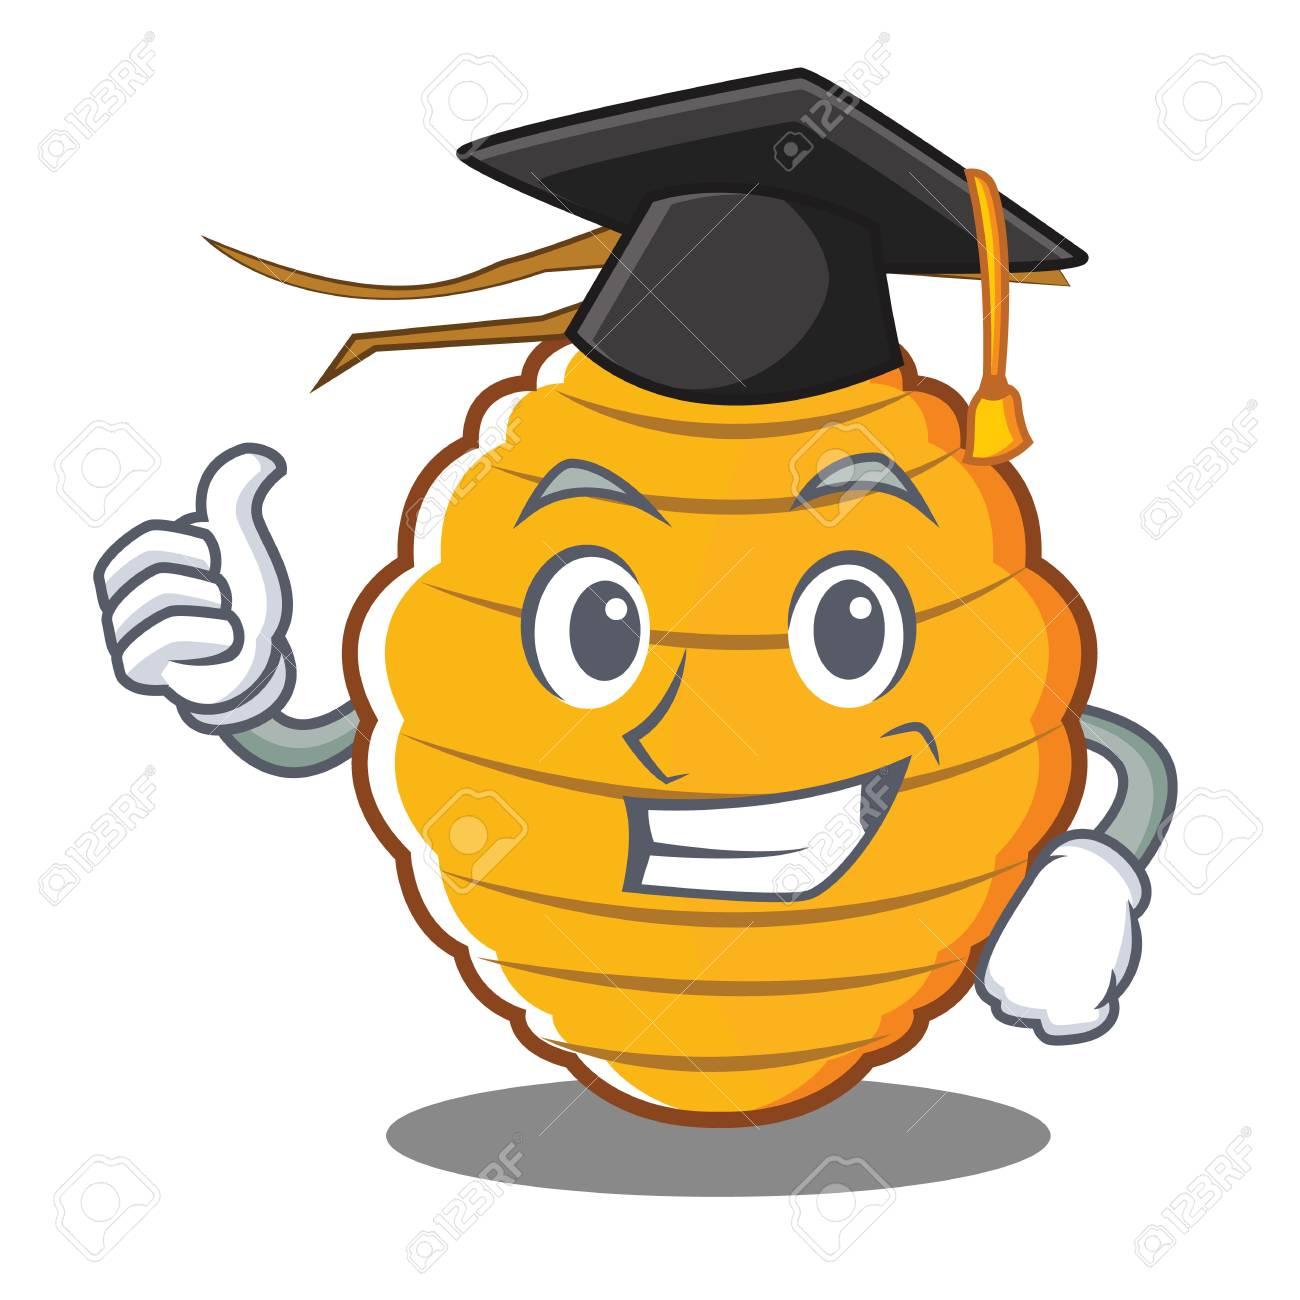 ilustracin de vector de dibujos animados de carcter de colmena de abeja de graduacin foto de